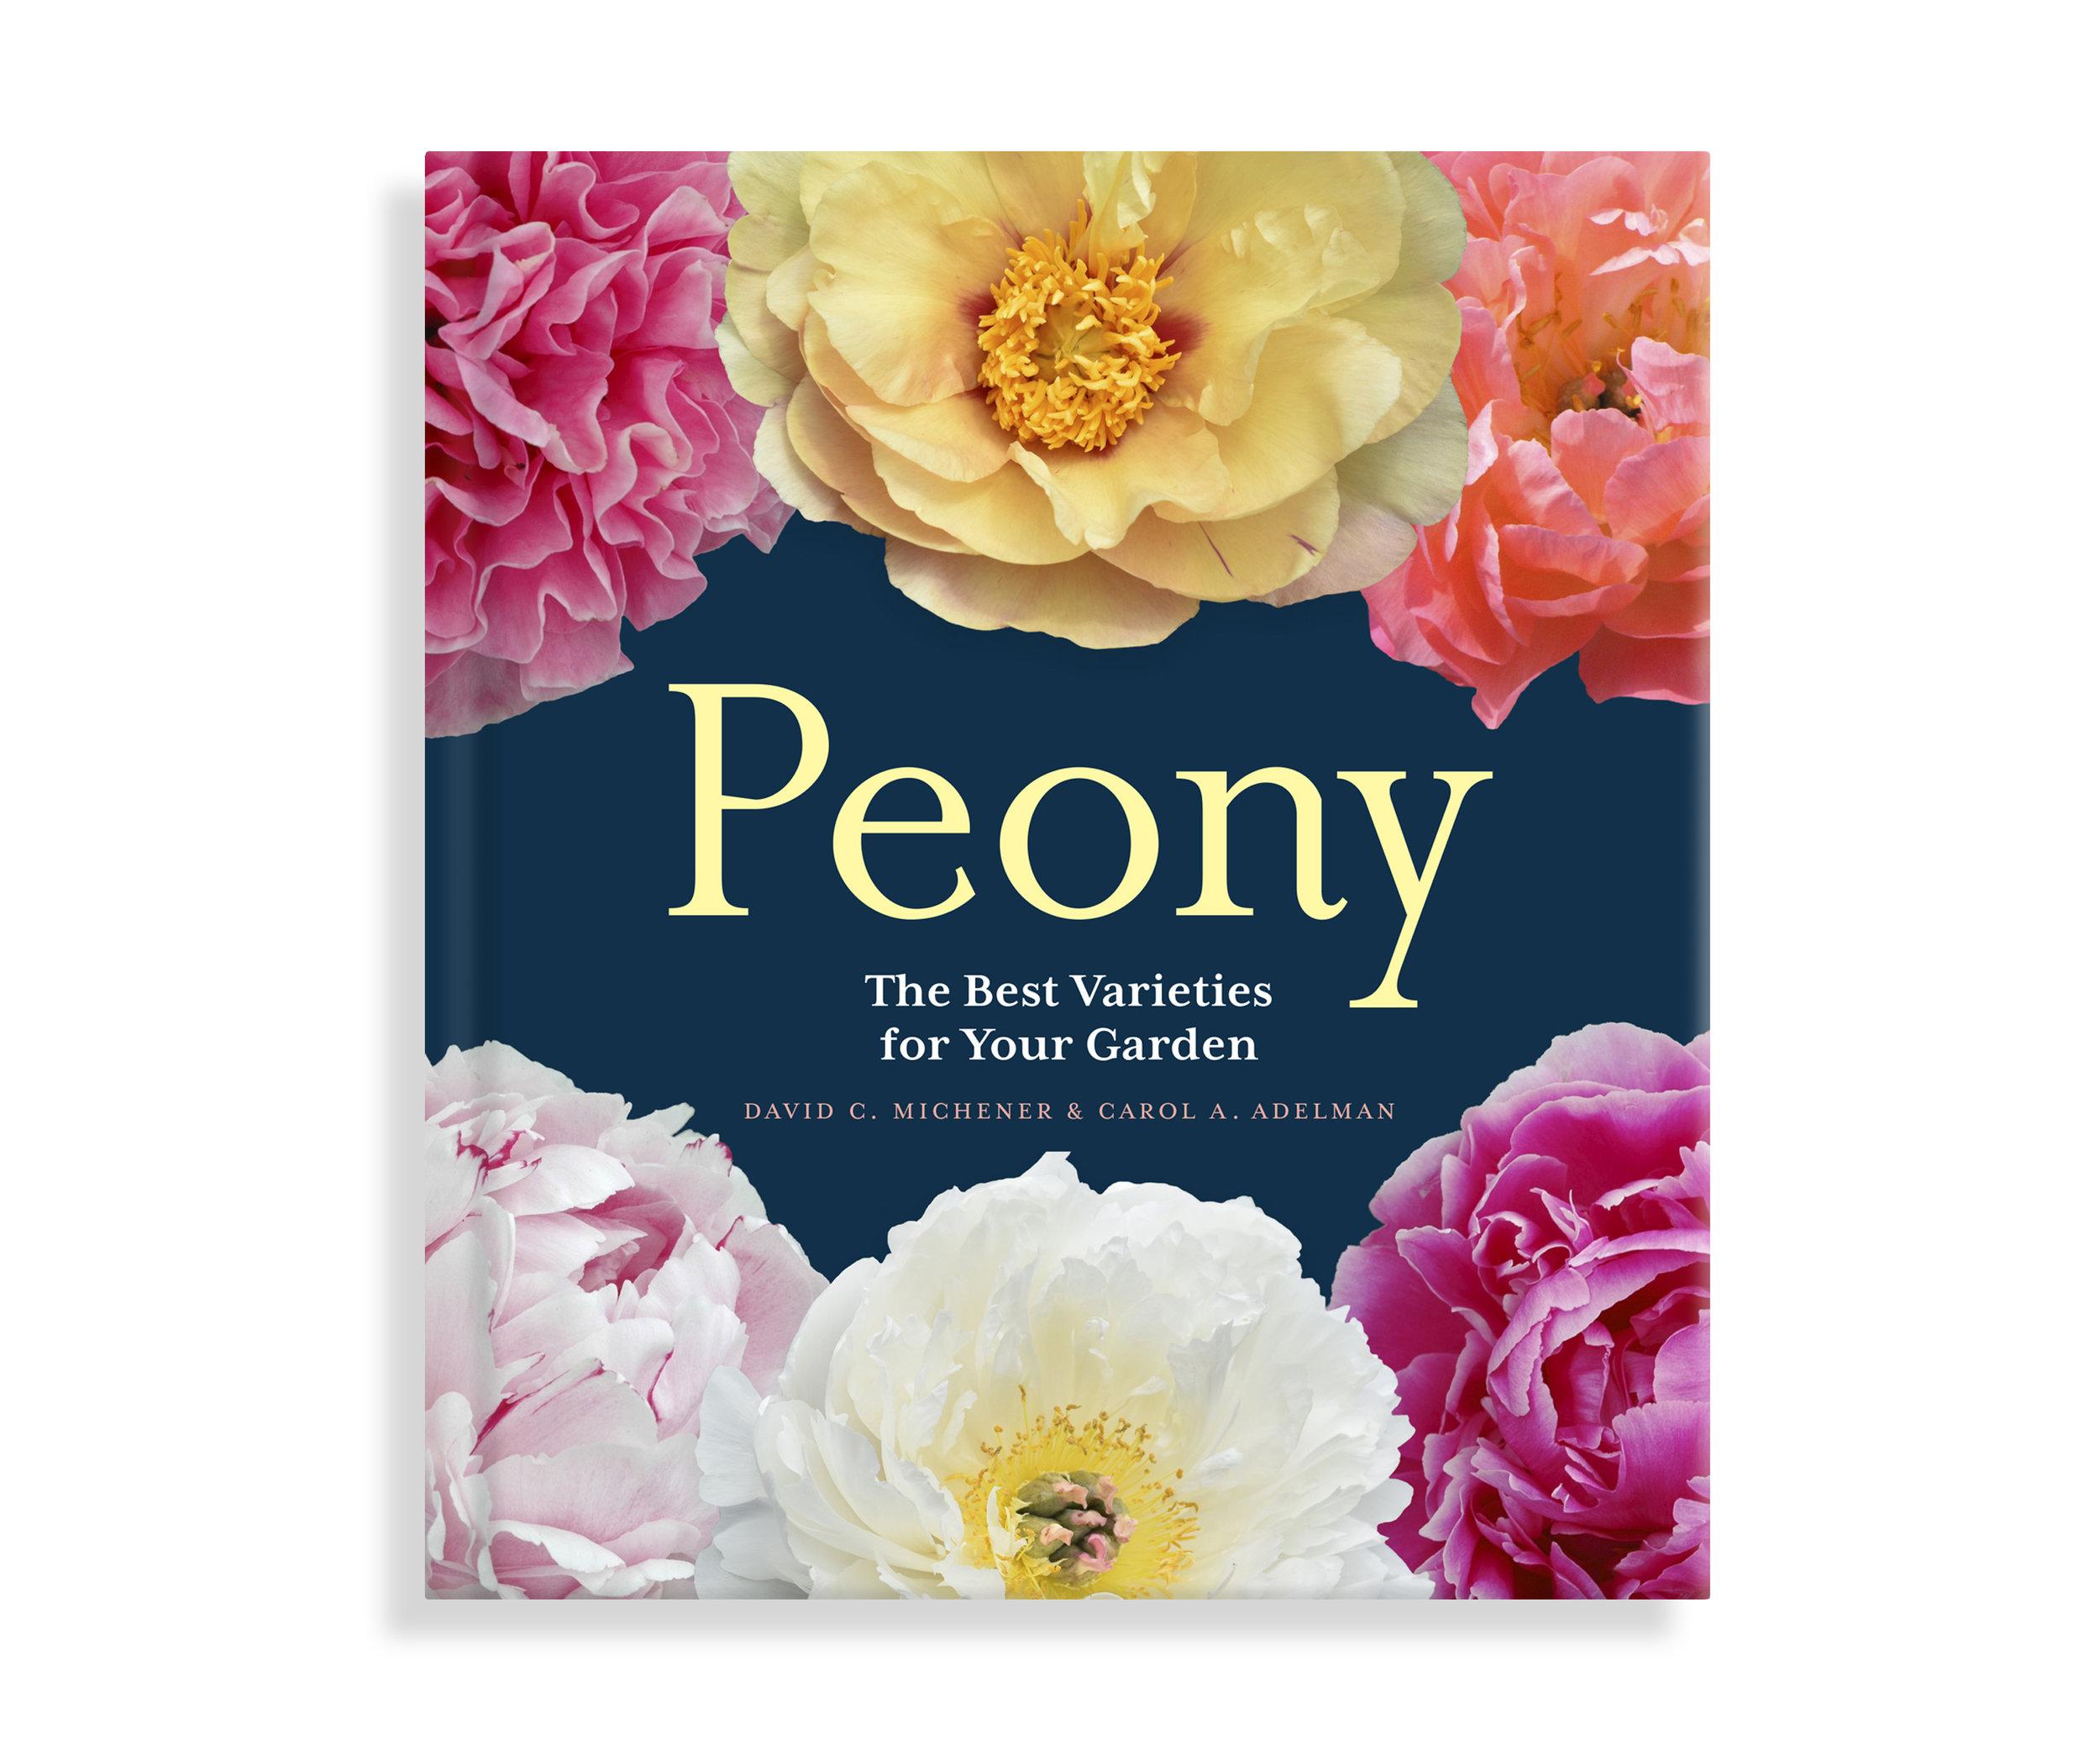 book_peony_cover_001.jpg